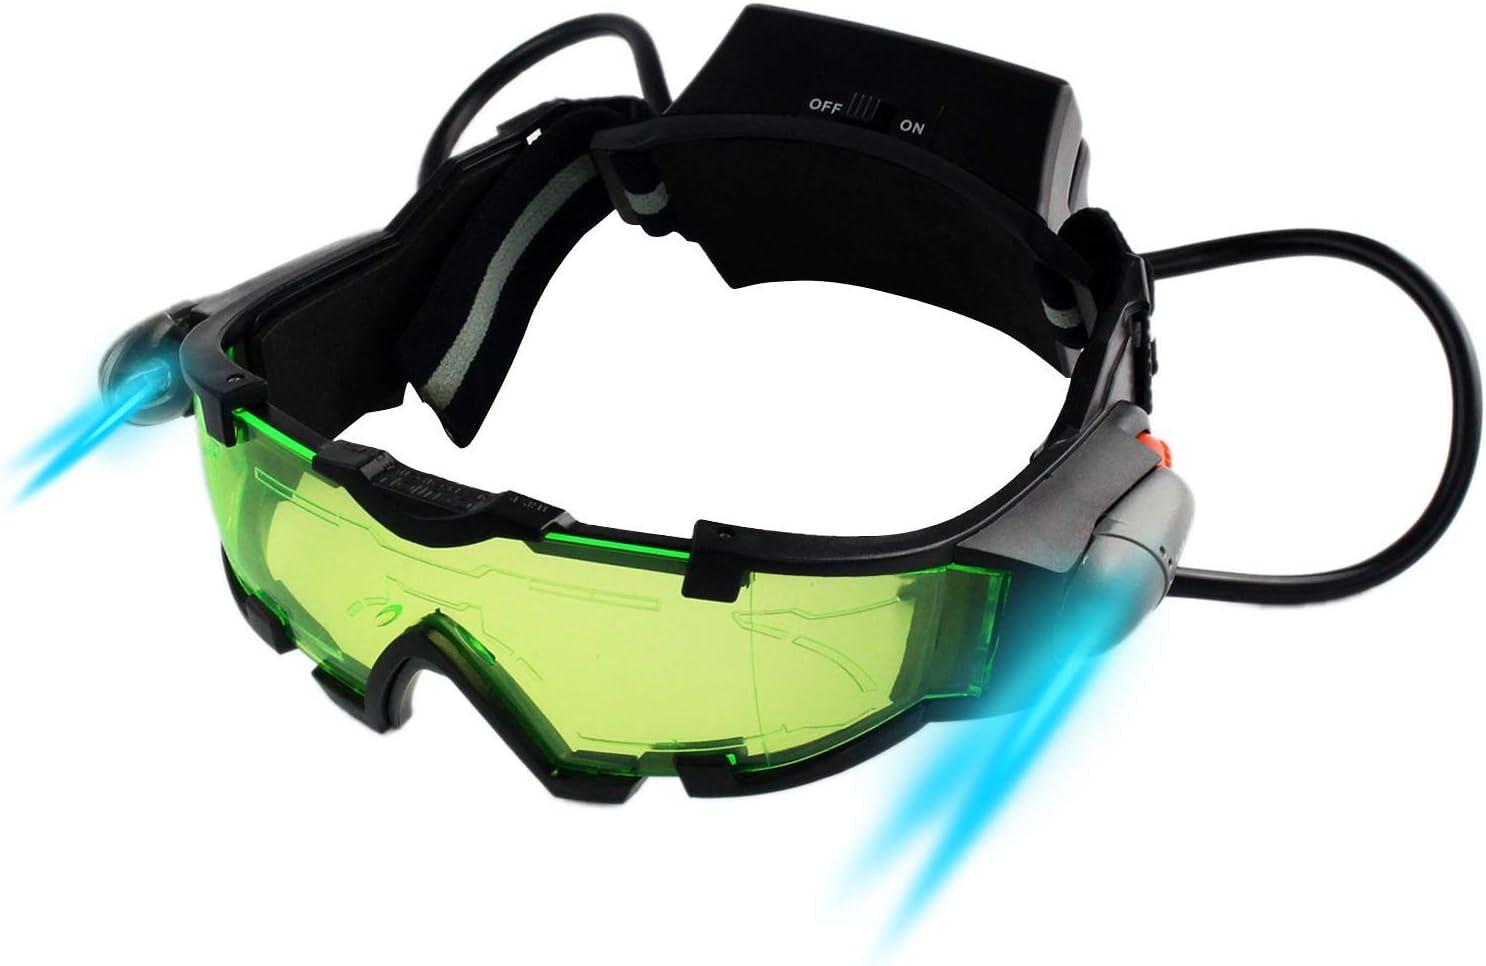 Bargain Yolyoo Night Vision Goggles F Regular discount Adjustable Kids LED